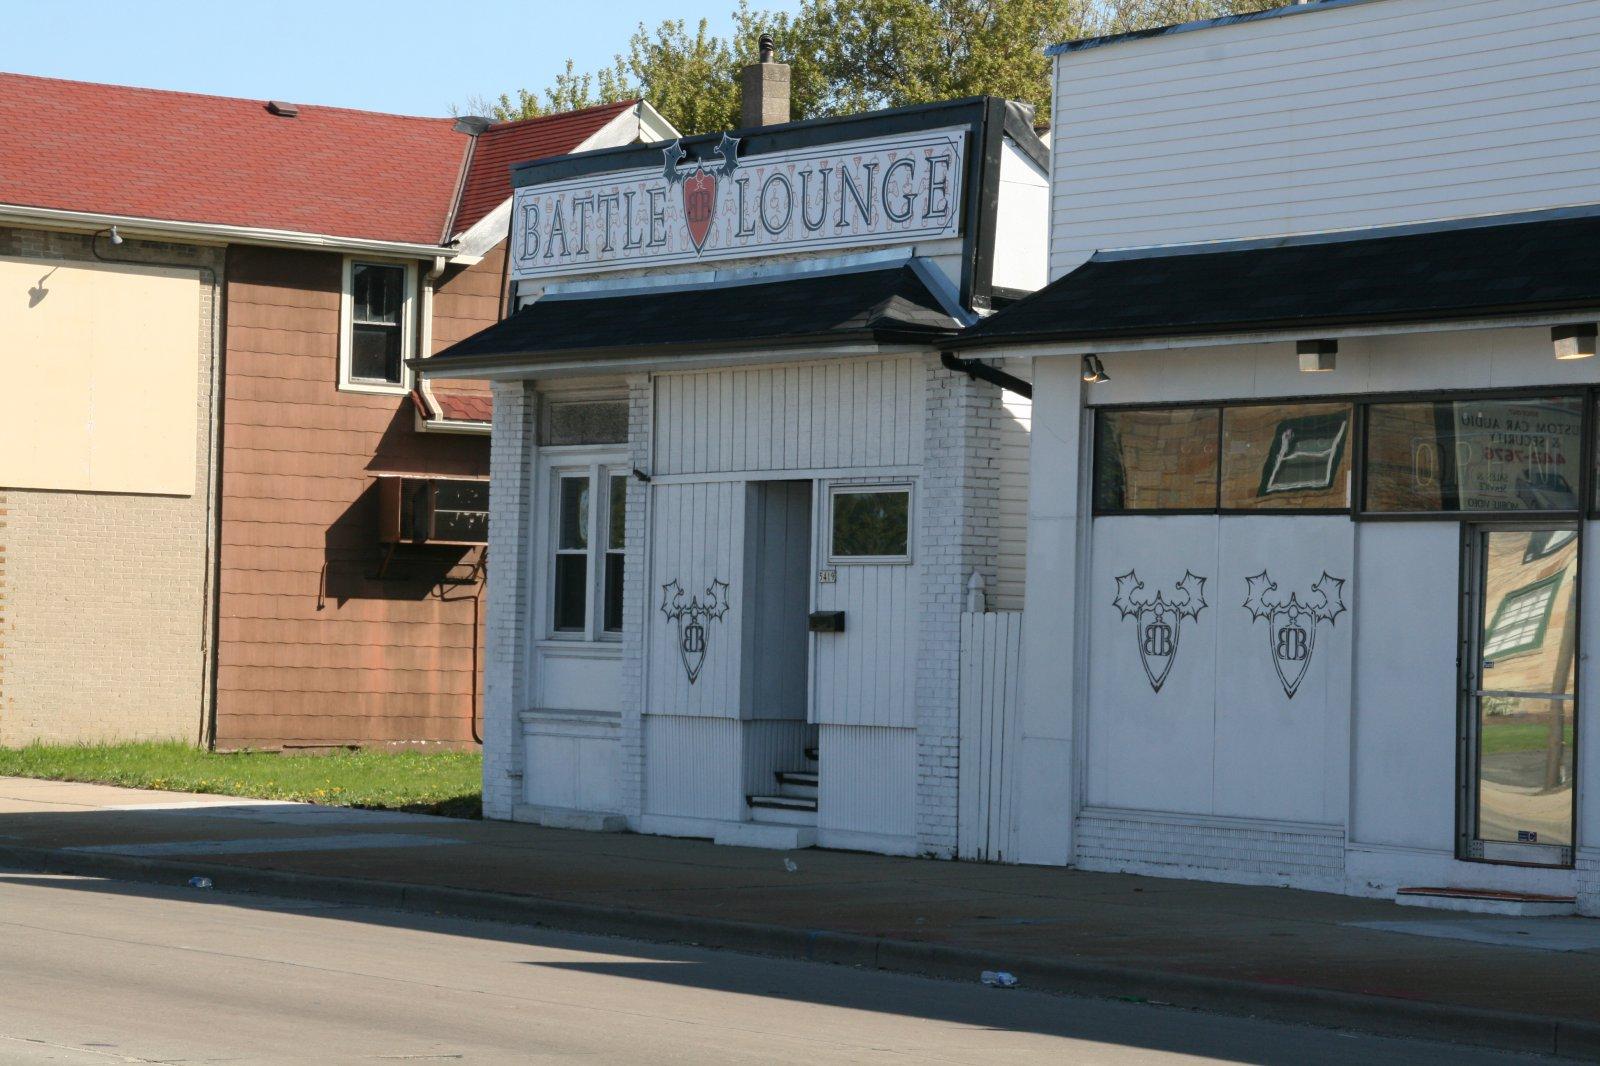 Battle Lounge